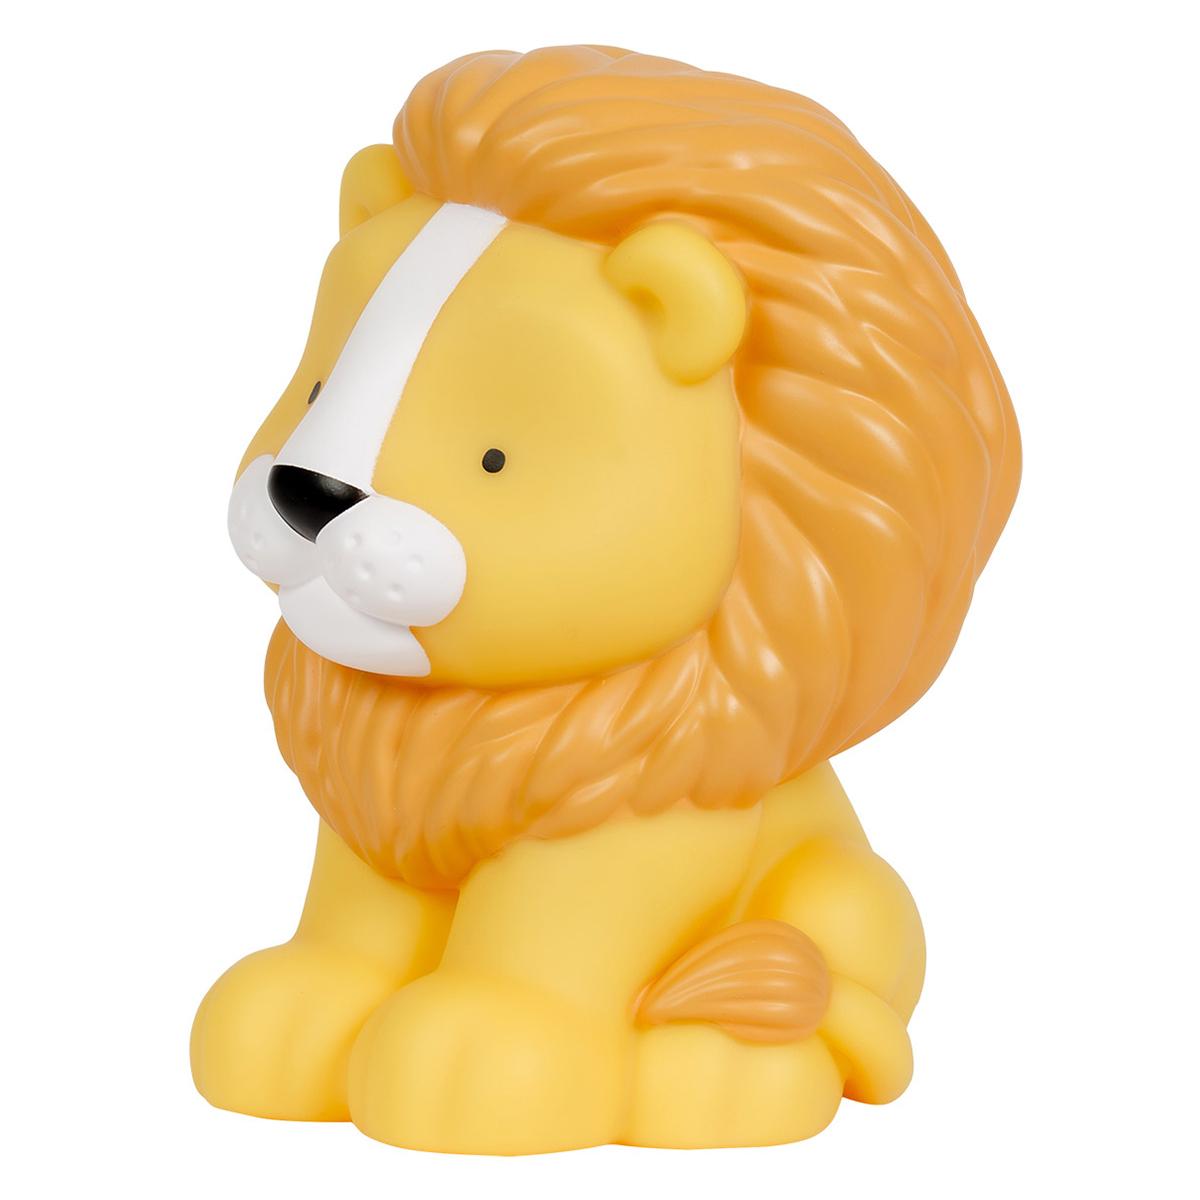 Veilleuse Veilleuse Lion - Jaune Veilleuse Lion - Jaune